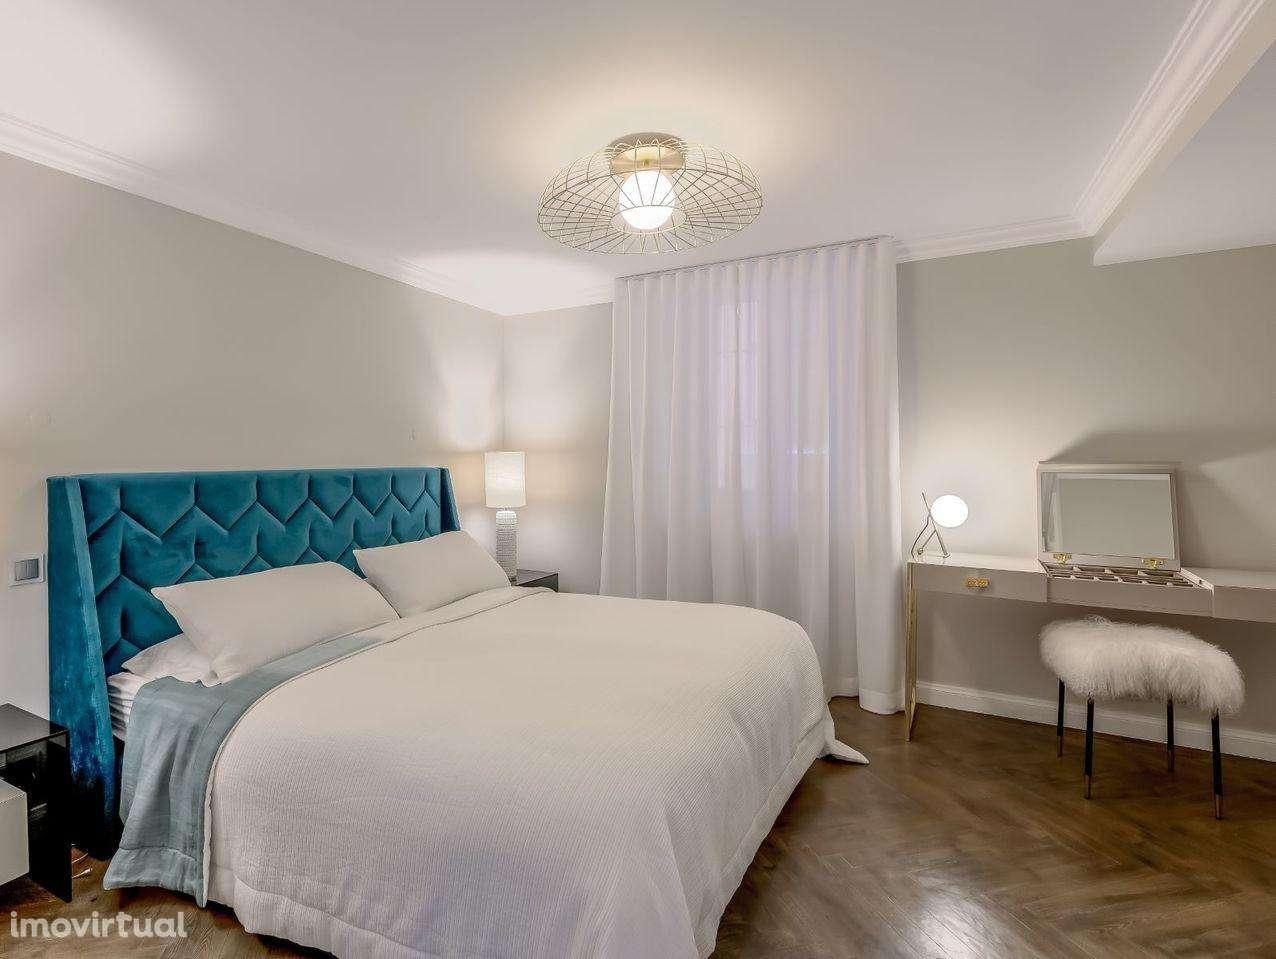 Apartamento para comprar, Misericórdia, Lisboa - Foto 10